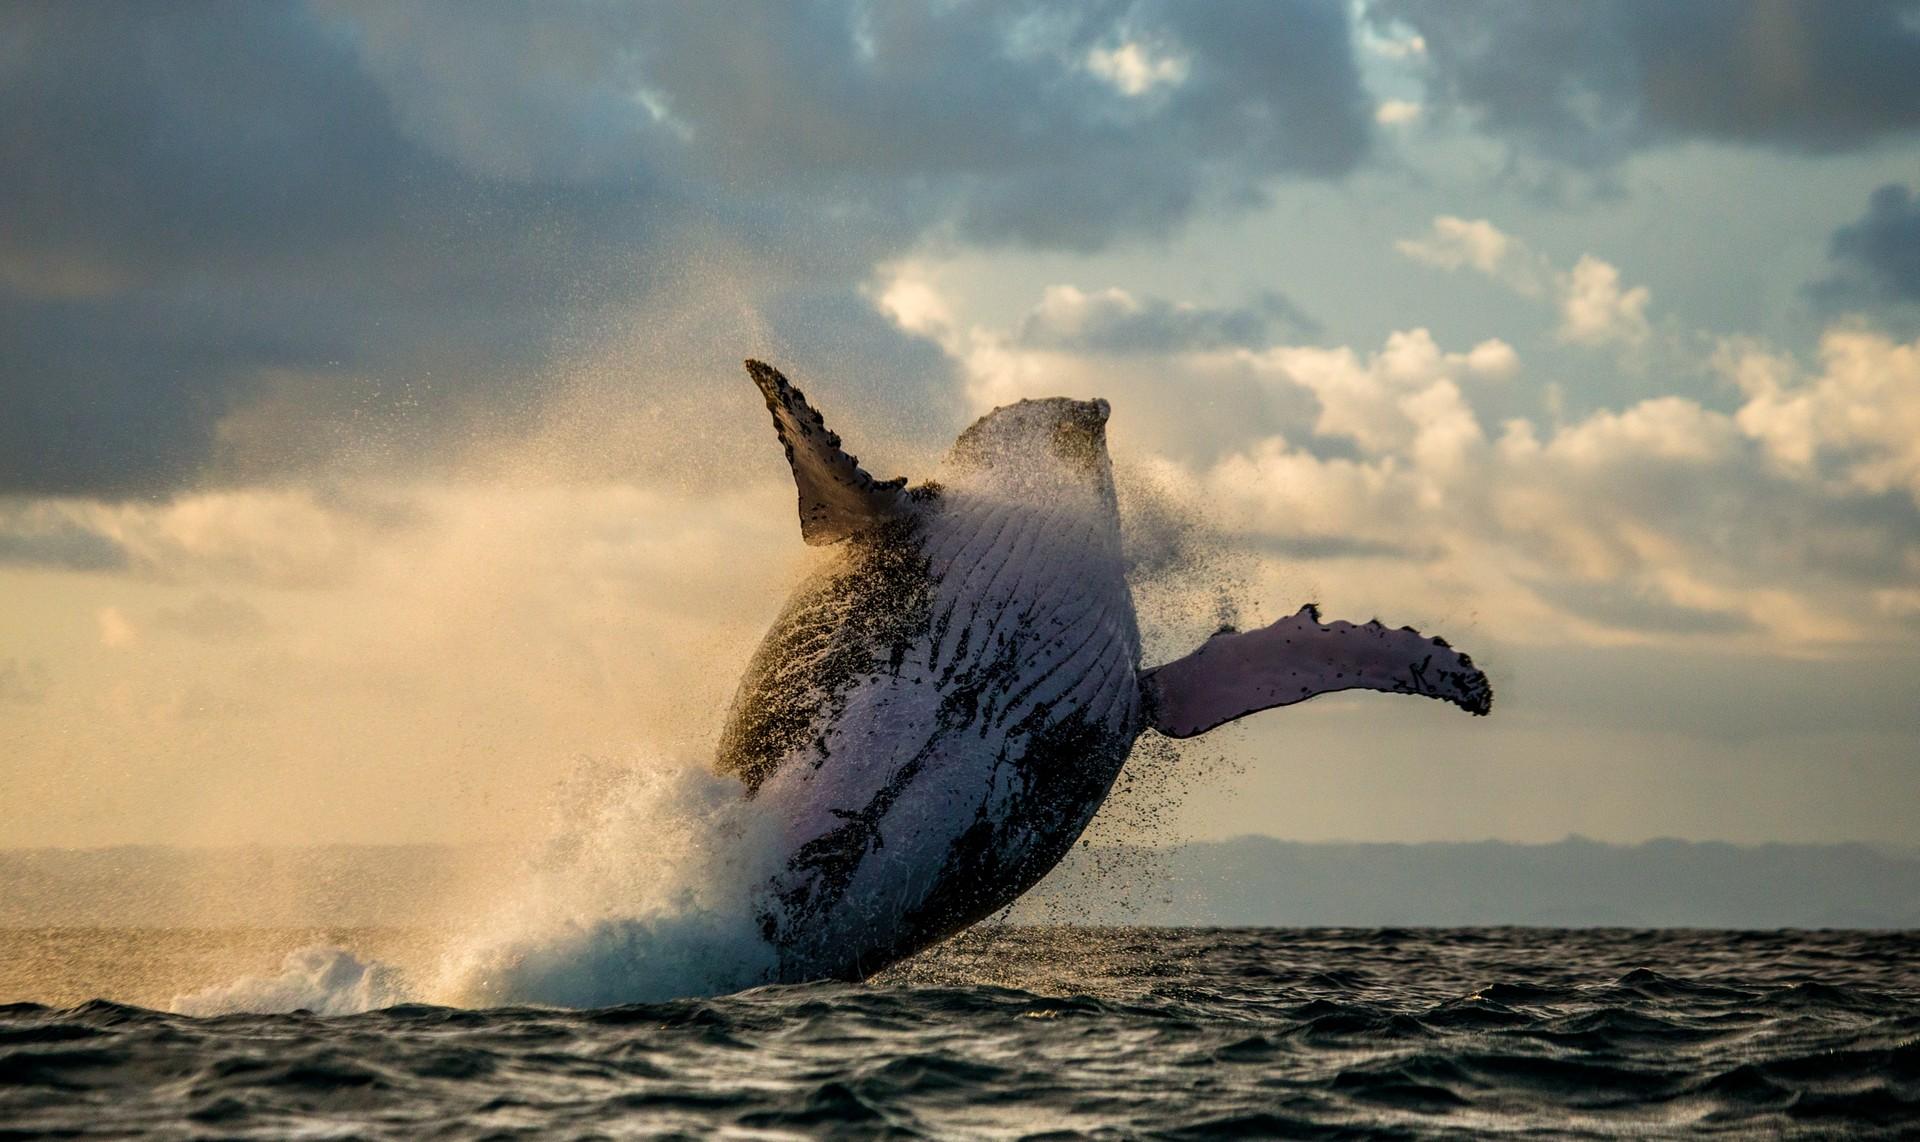 Whale breaching at sunset off Ile Sainte Marie, Madagascar